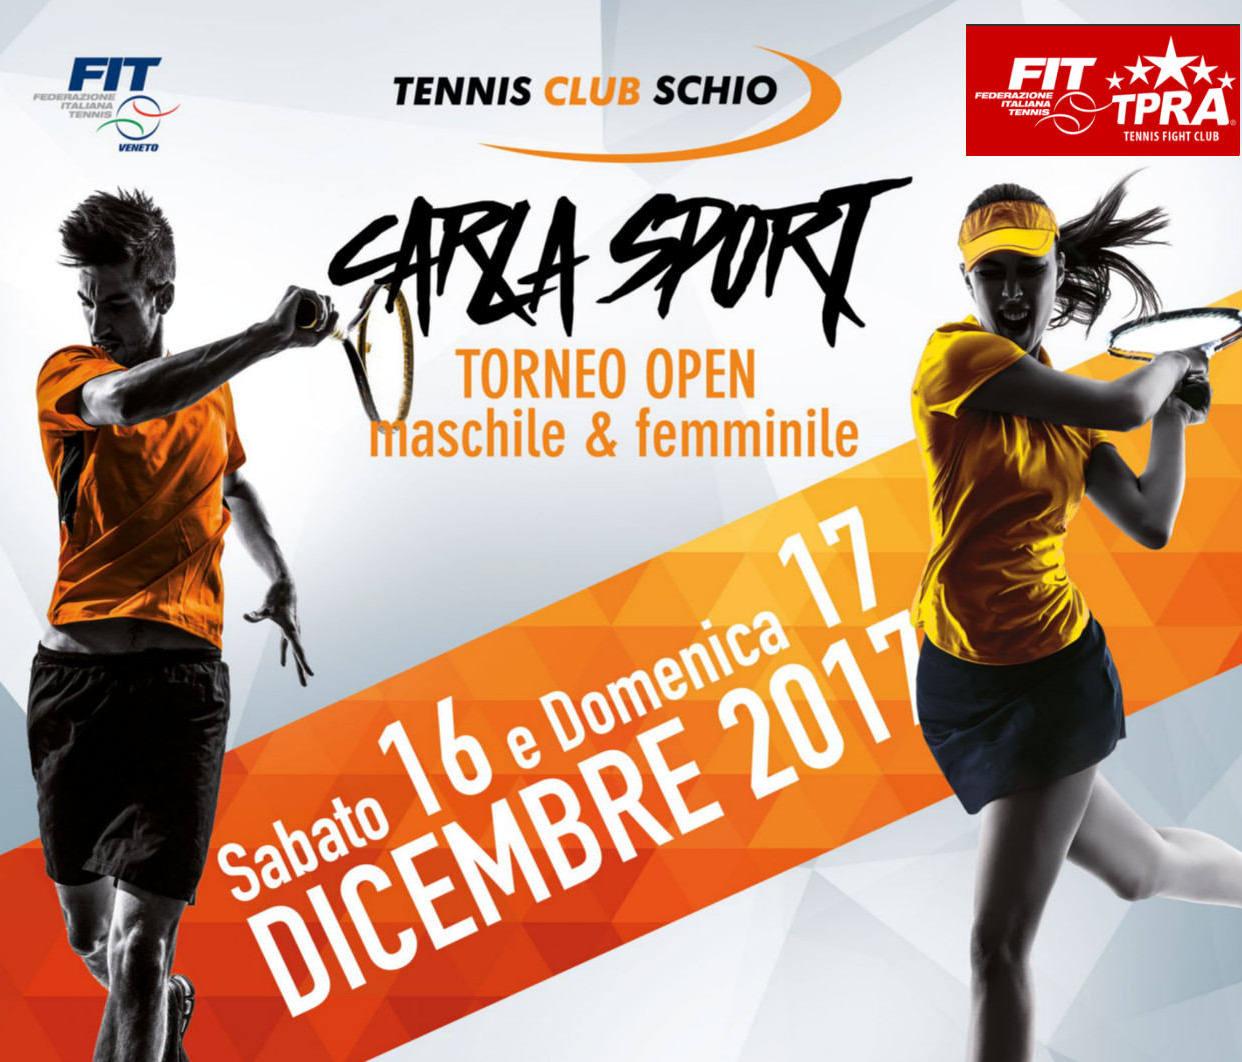 Infotennis Calendario Tornei.Tennis Club Schio Sito Ufficiale